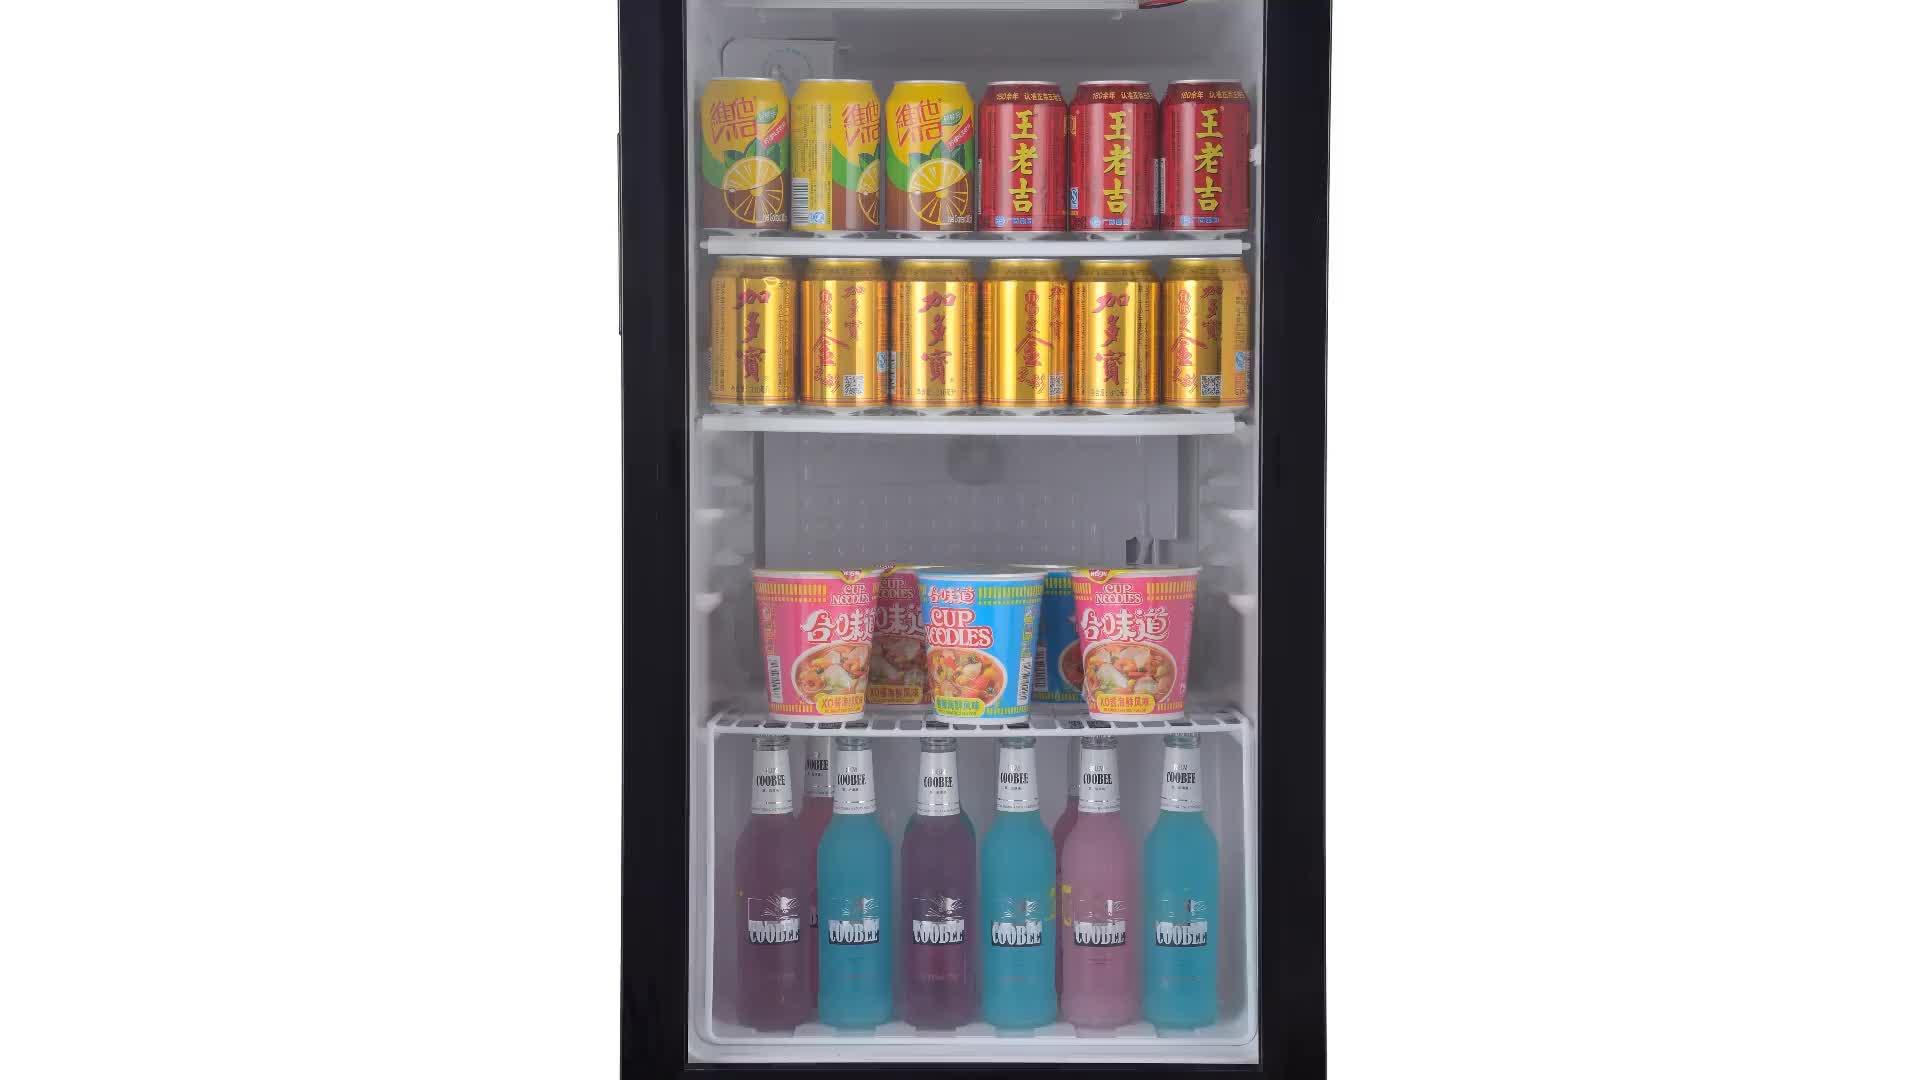 Kühlschrank Von Red Bull : Fabrik preis softdrink display red bull minibar kühlschrank